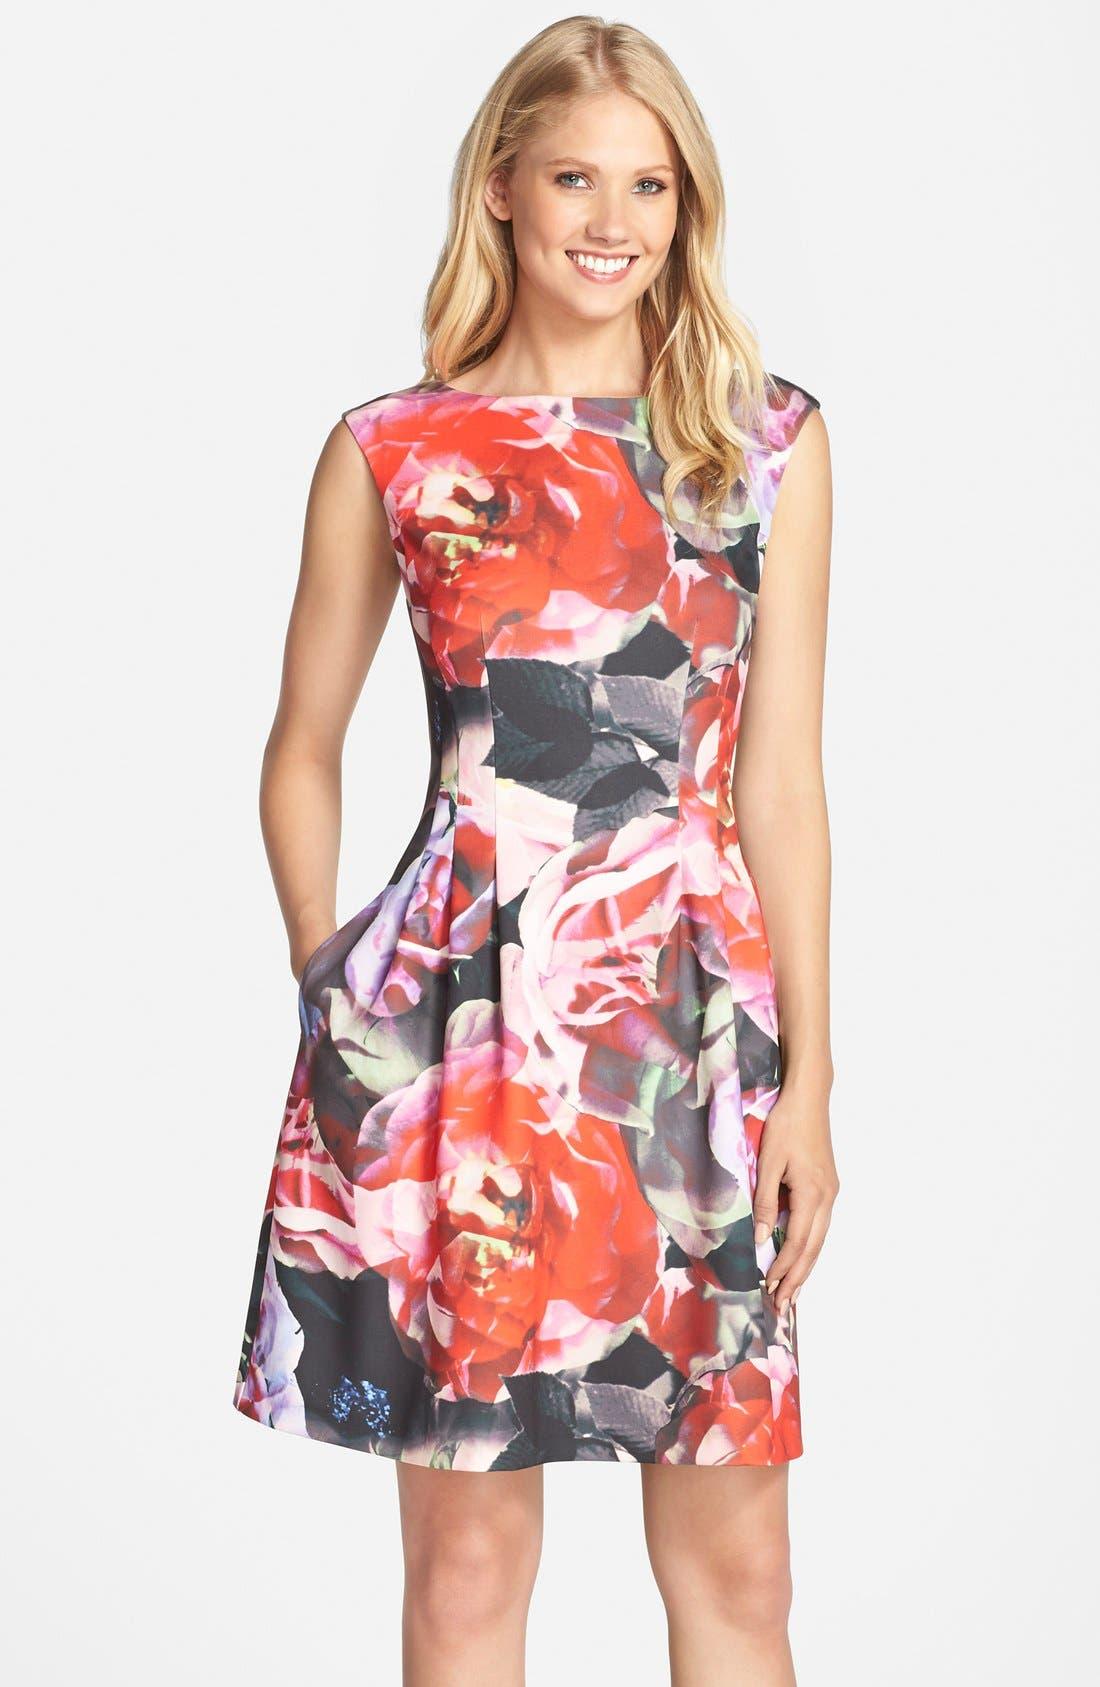 Alternate Image 1 Selected - Vince Camuto Floral Print Scuba Fit & Flare Dress (Regular & Petite)